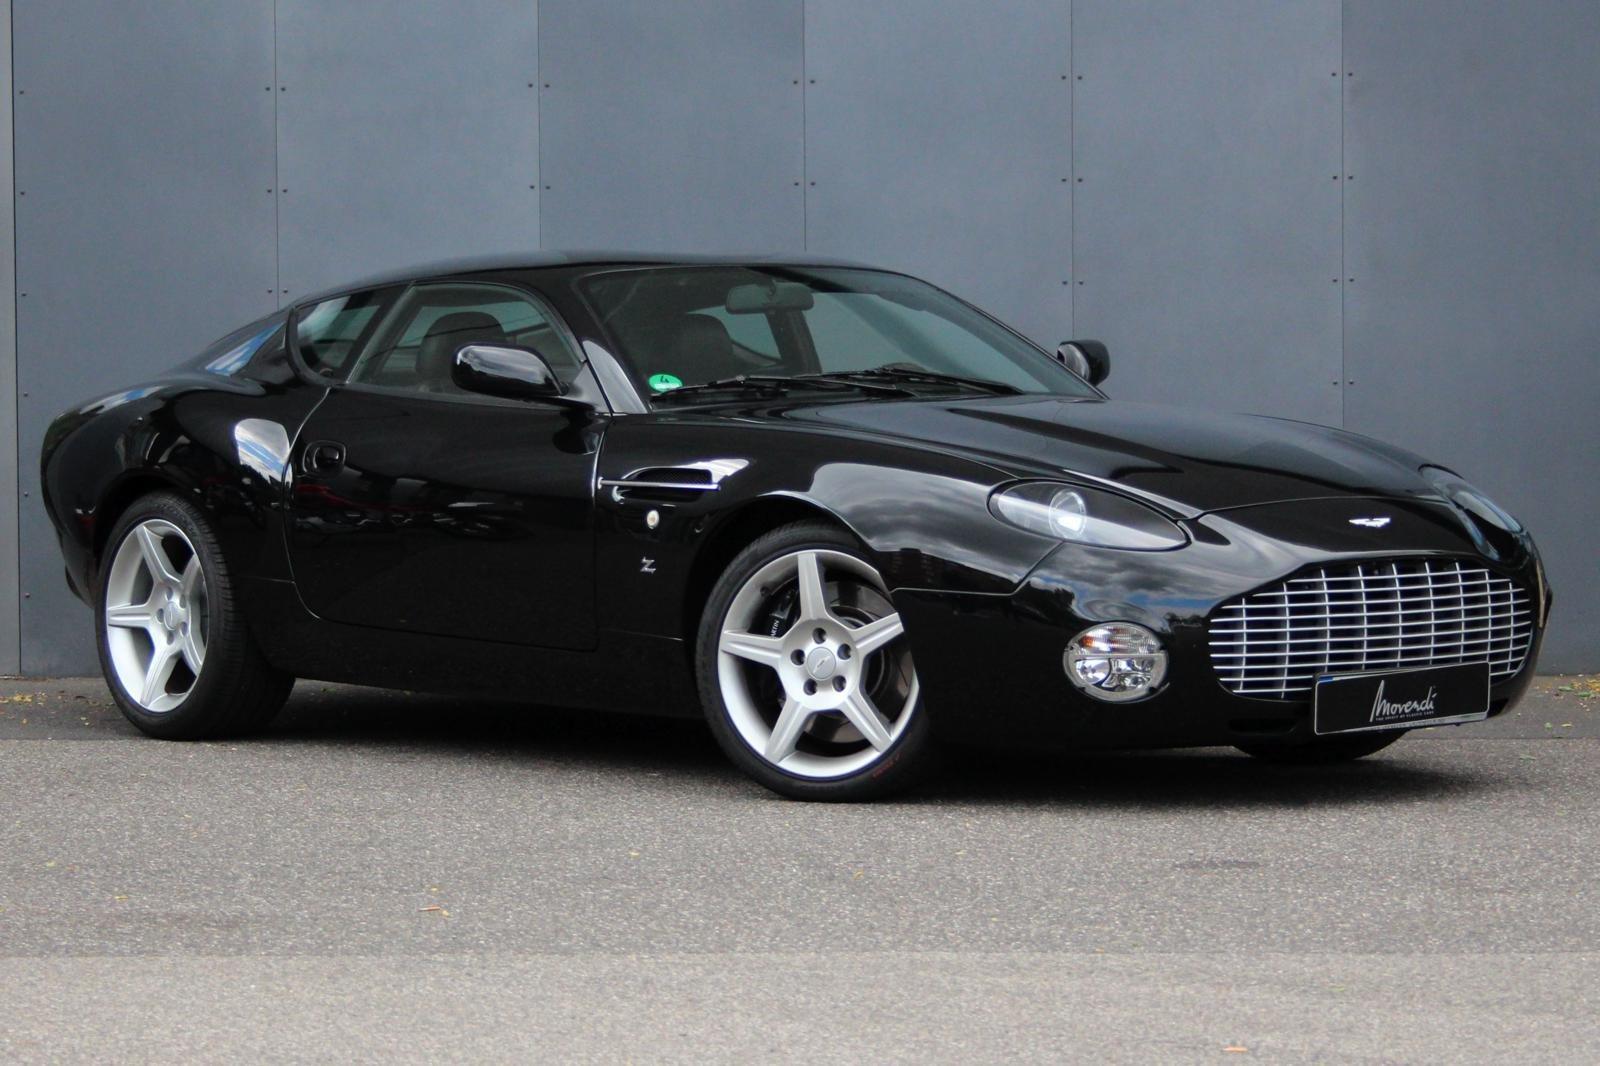 2004 Aston Martin DB 7 GT Zagato LHD  For Sale (picture 1 of 6)